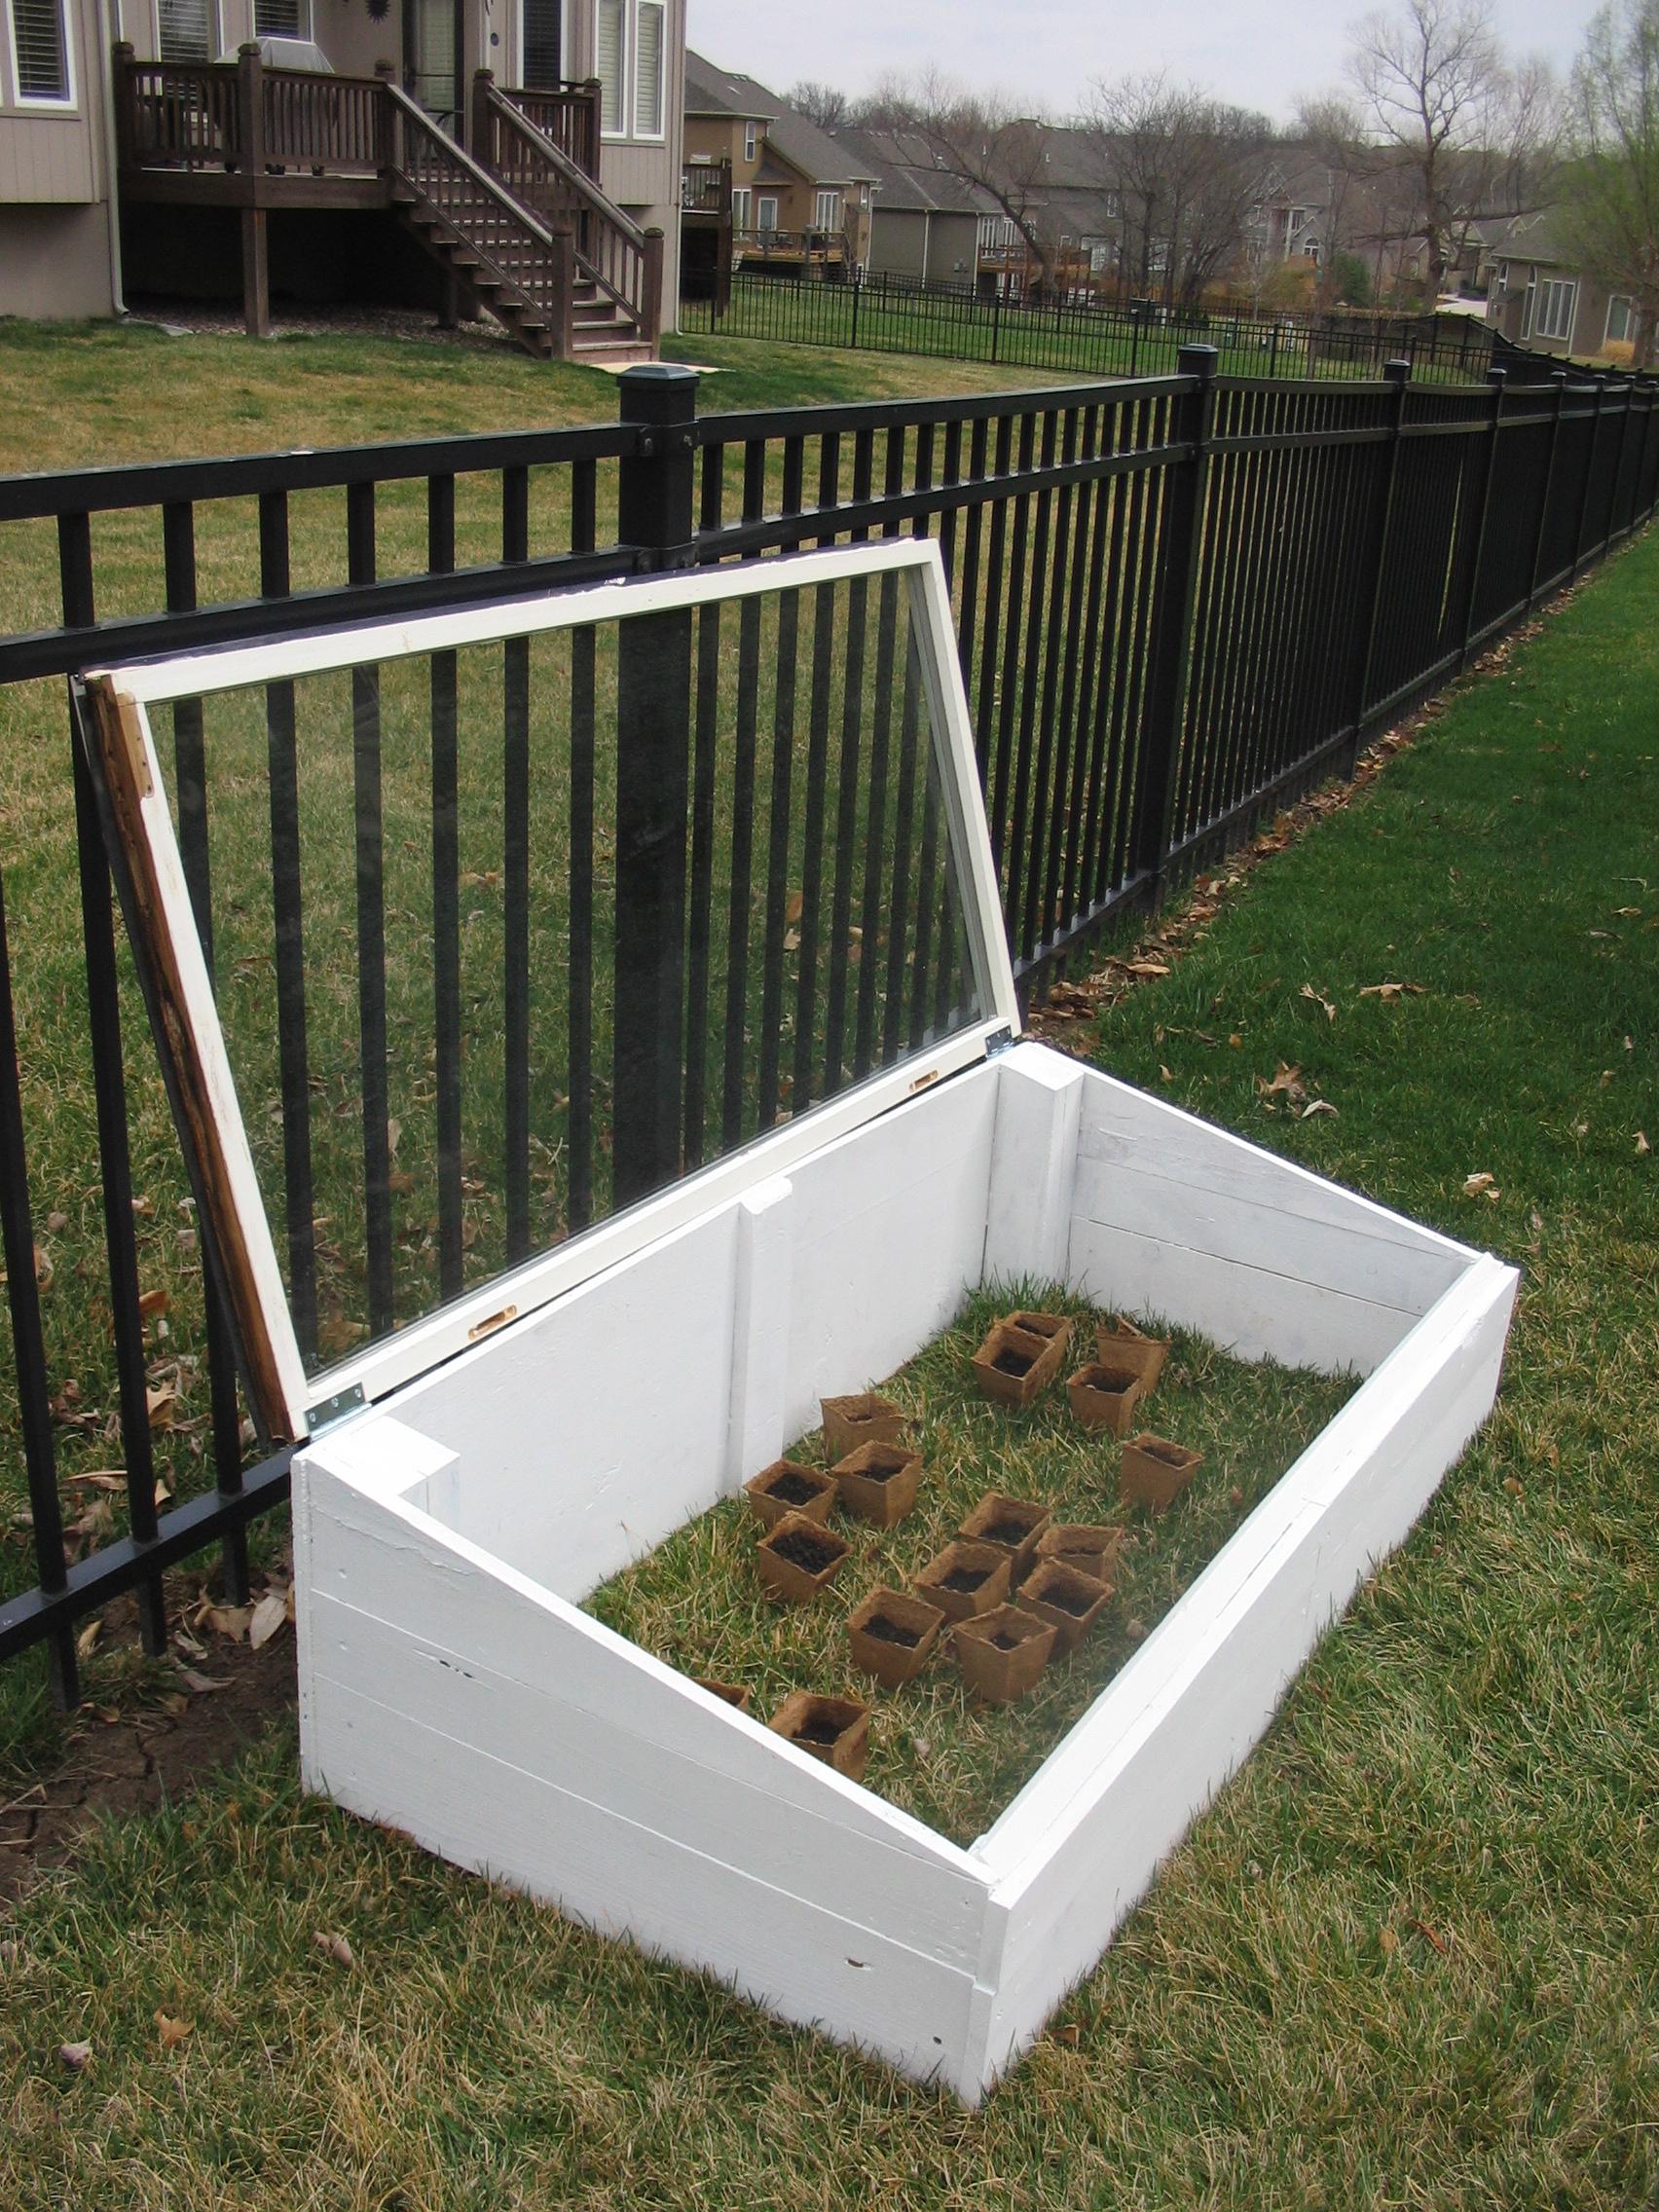 Build a SeedHouse/MiniGreenhouse!